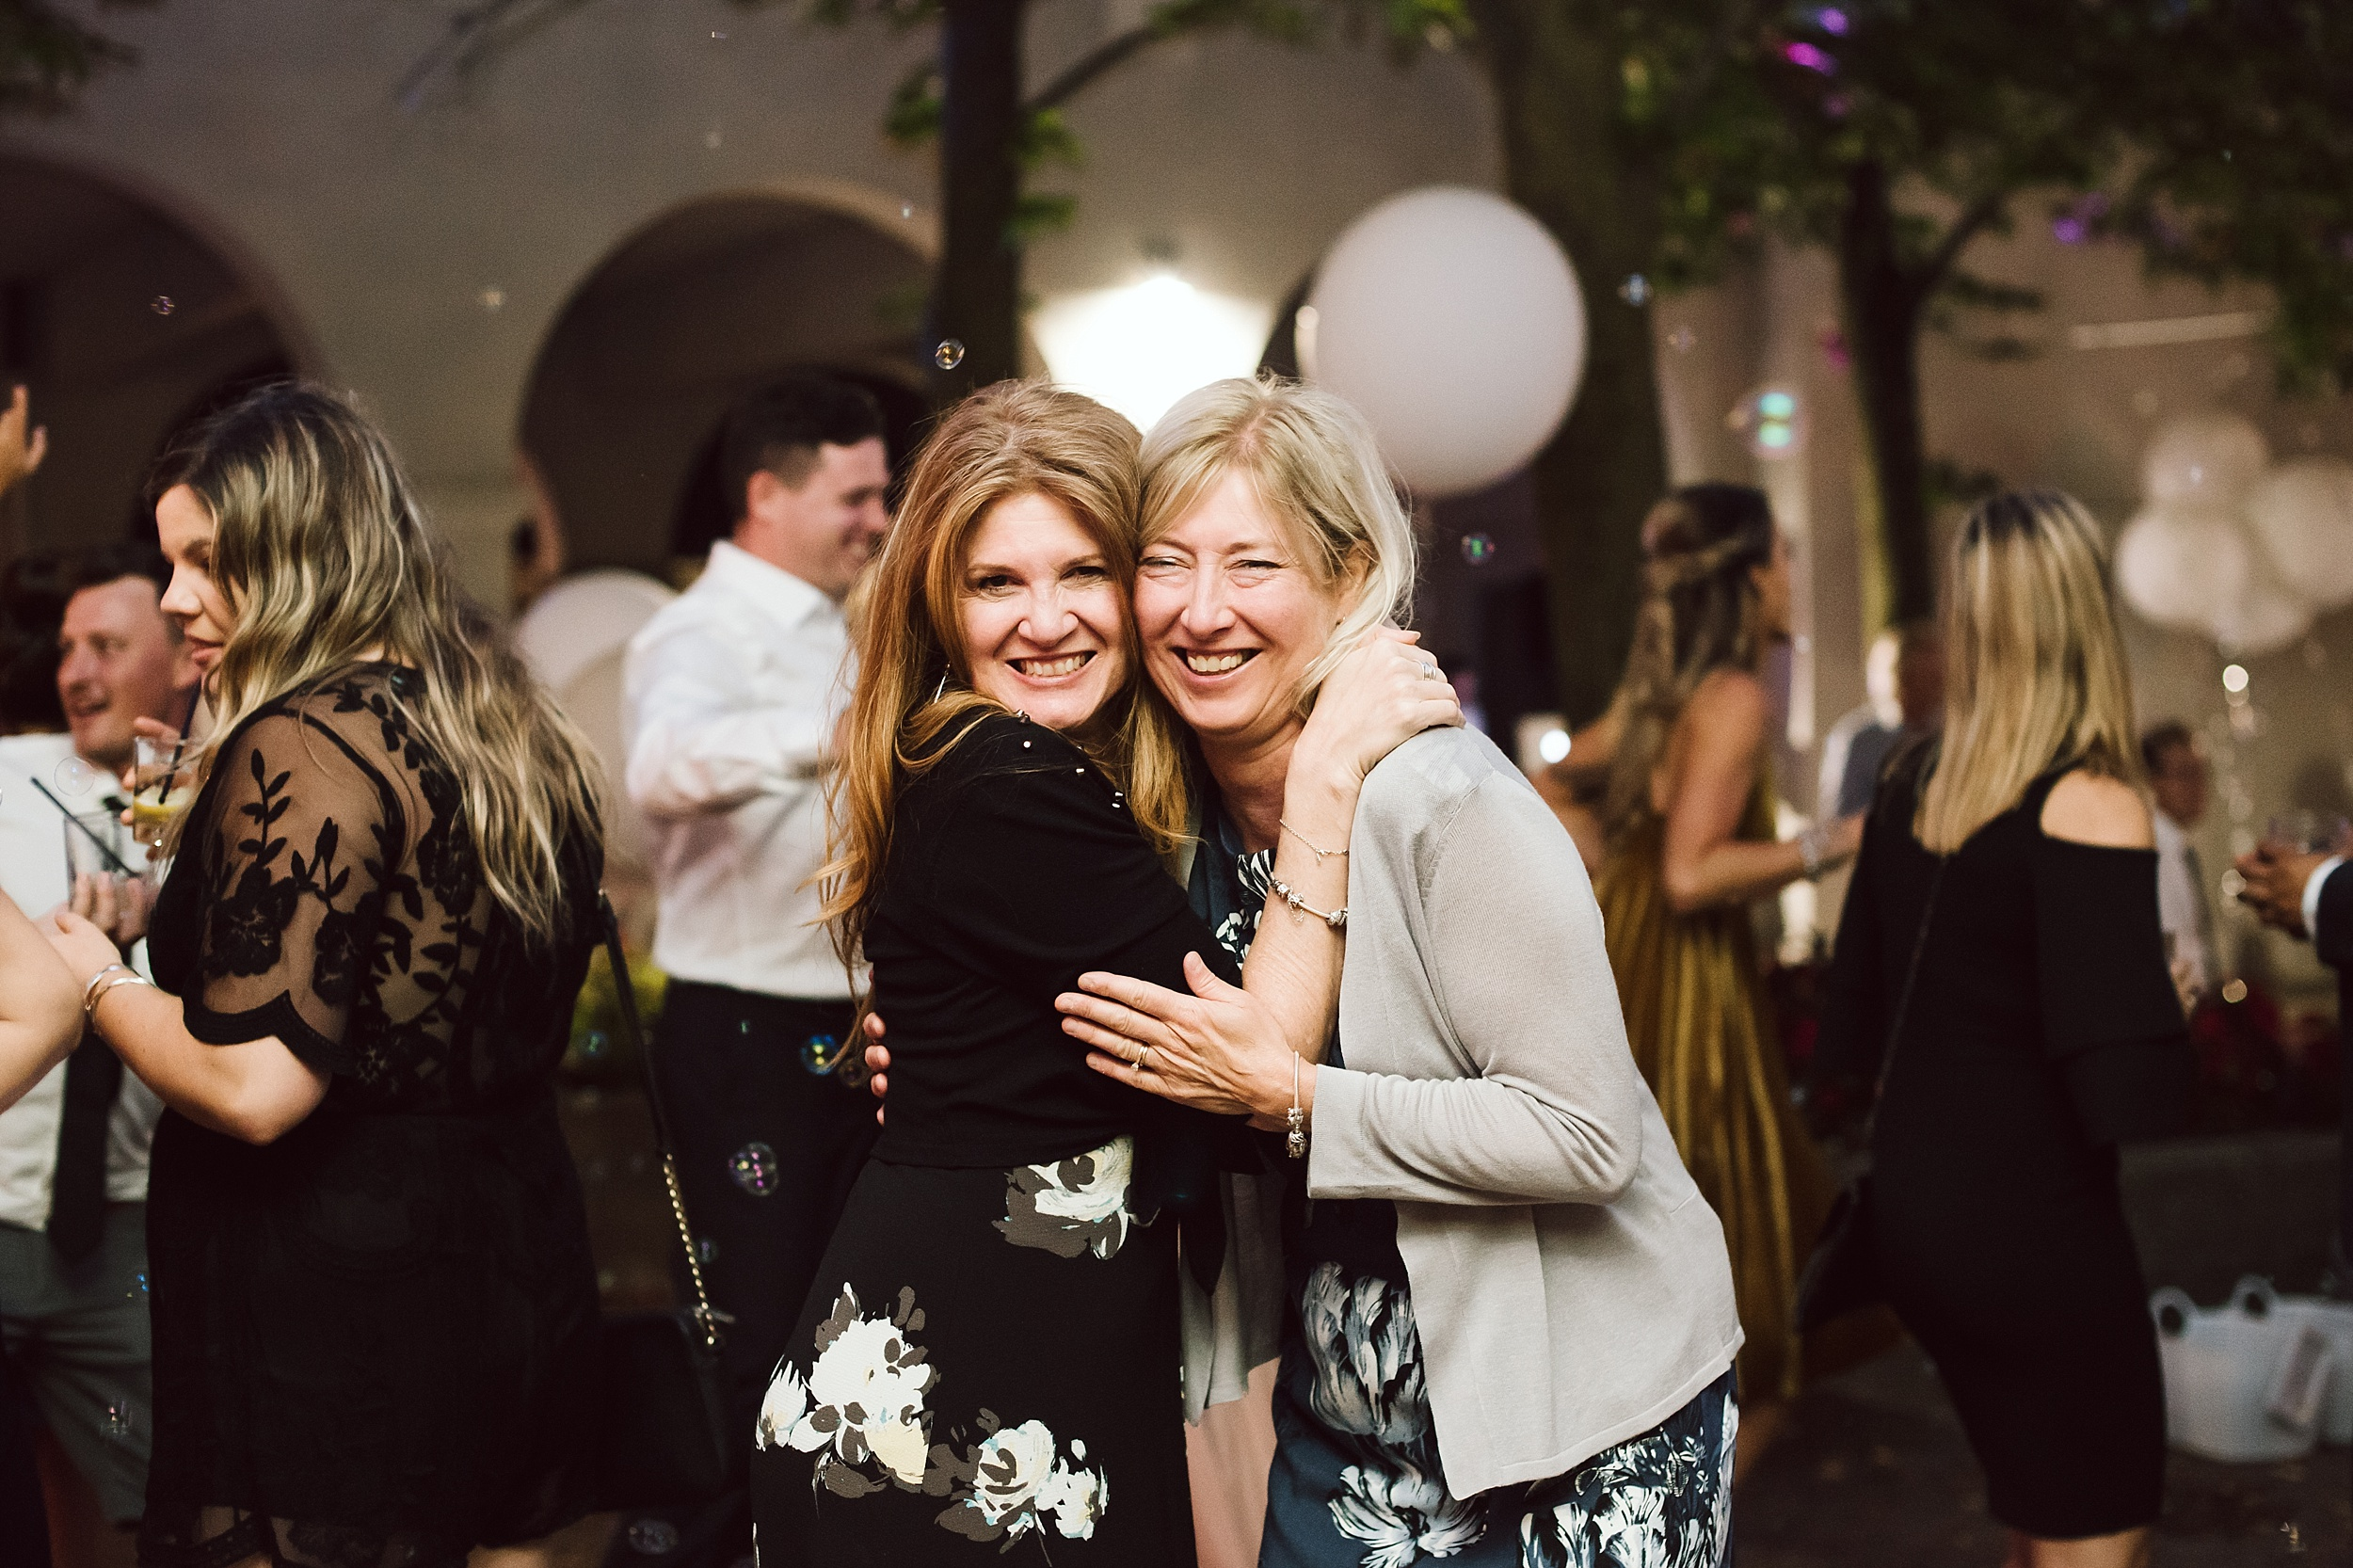 Sunnyside_Pavilion_Wedding_Toronto_Photographer_0124.jpg